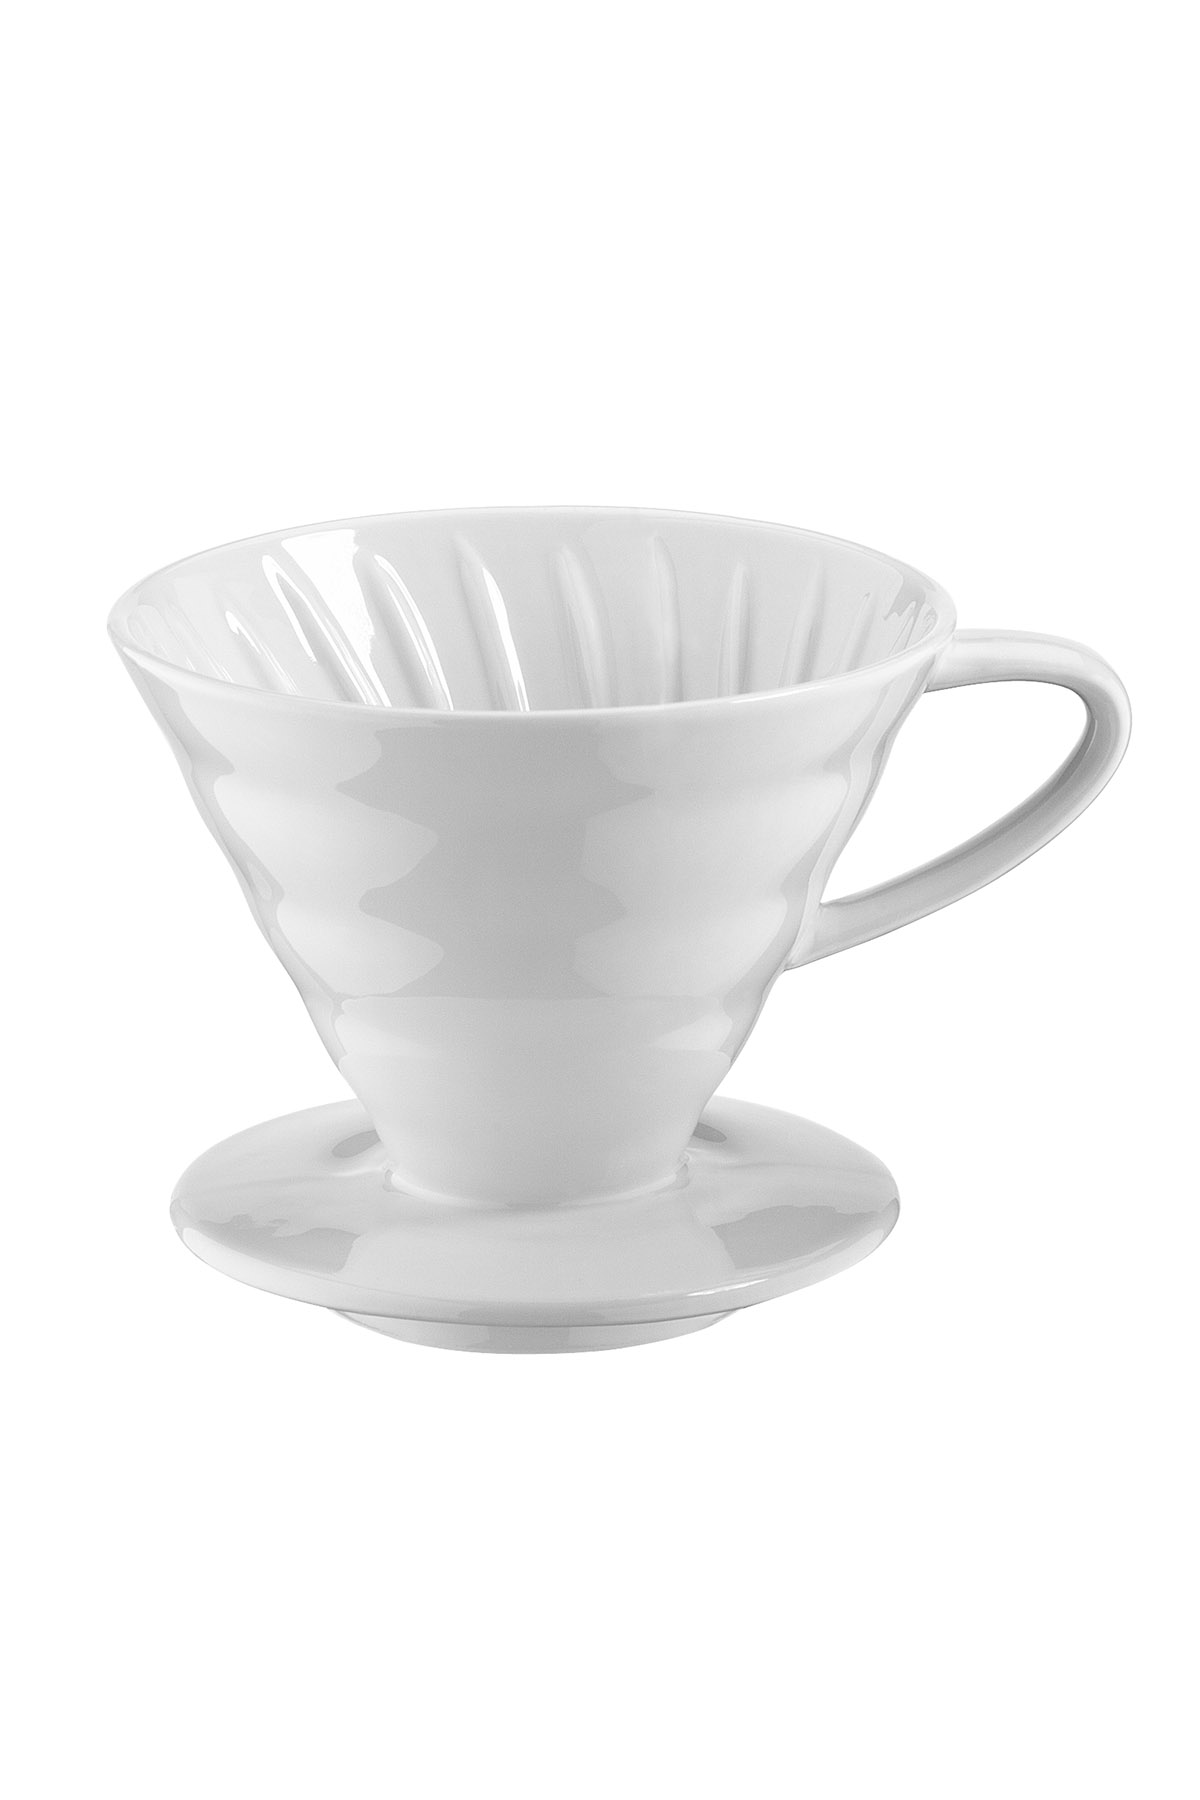 Kütahya Porselen - Kütahya Porselen Barista Kahve Filtresi Beyaz